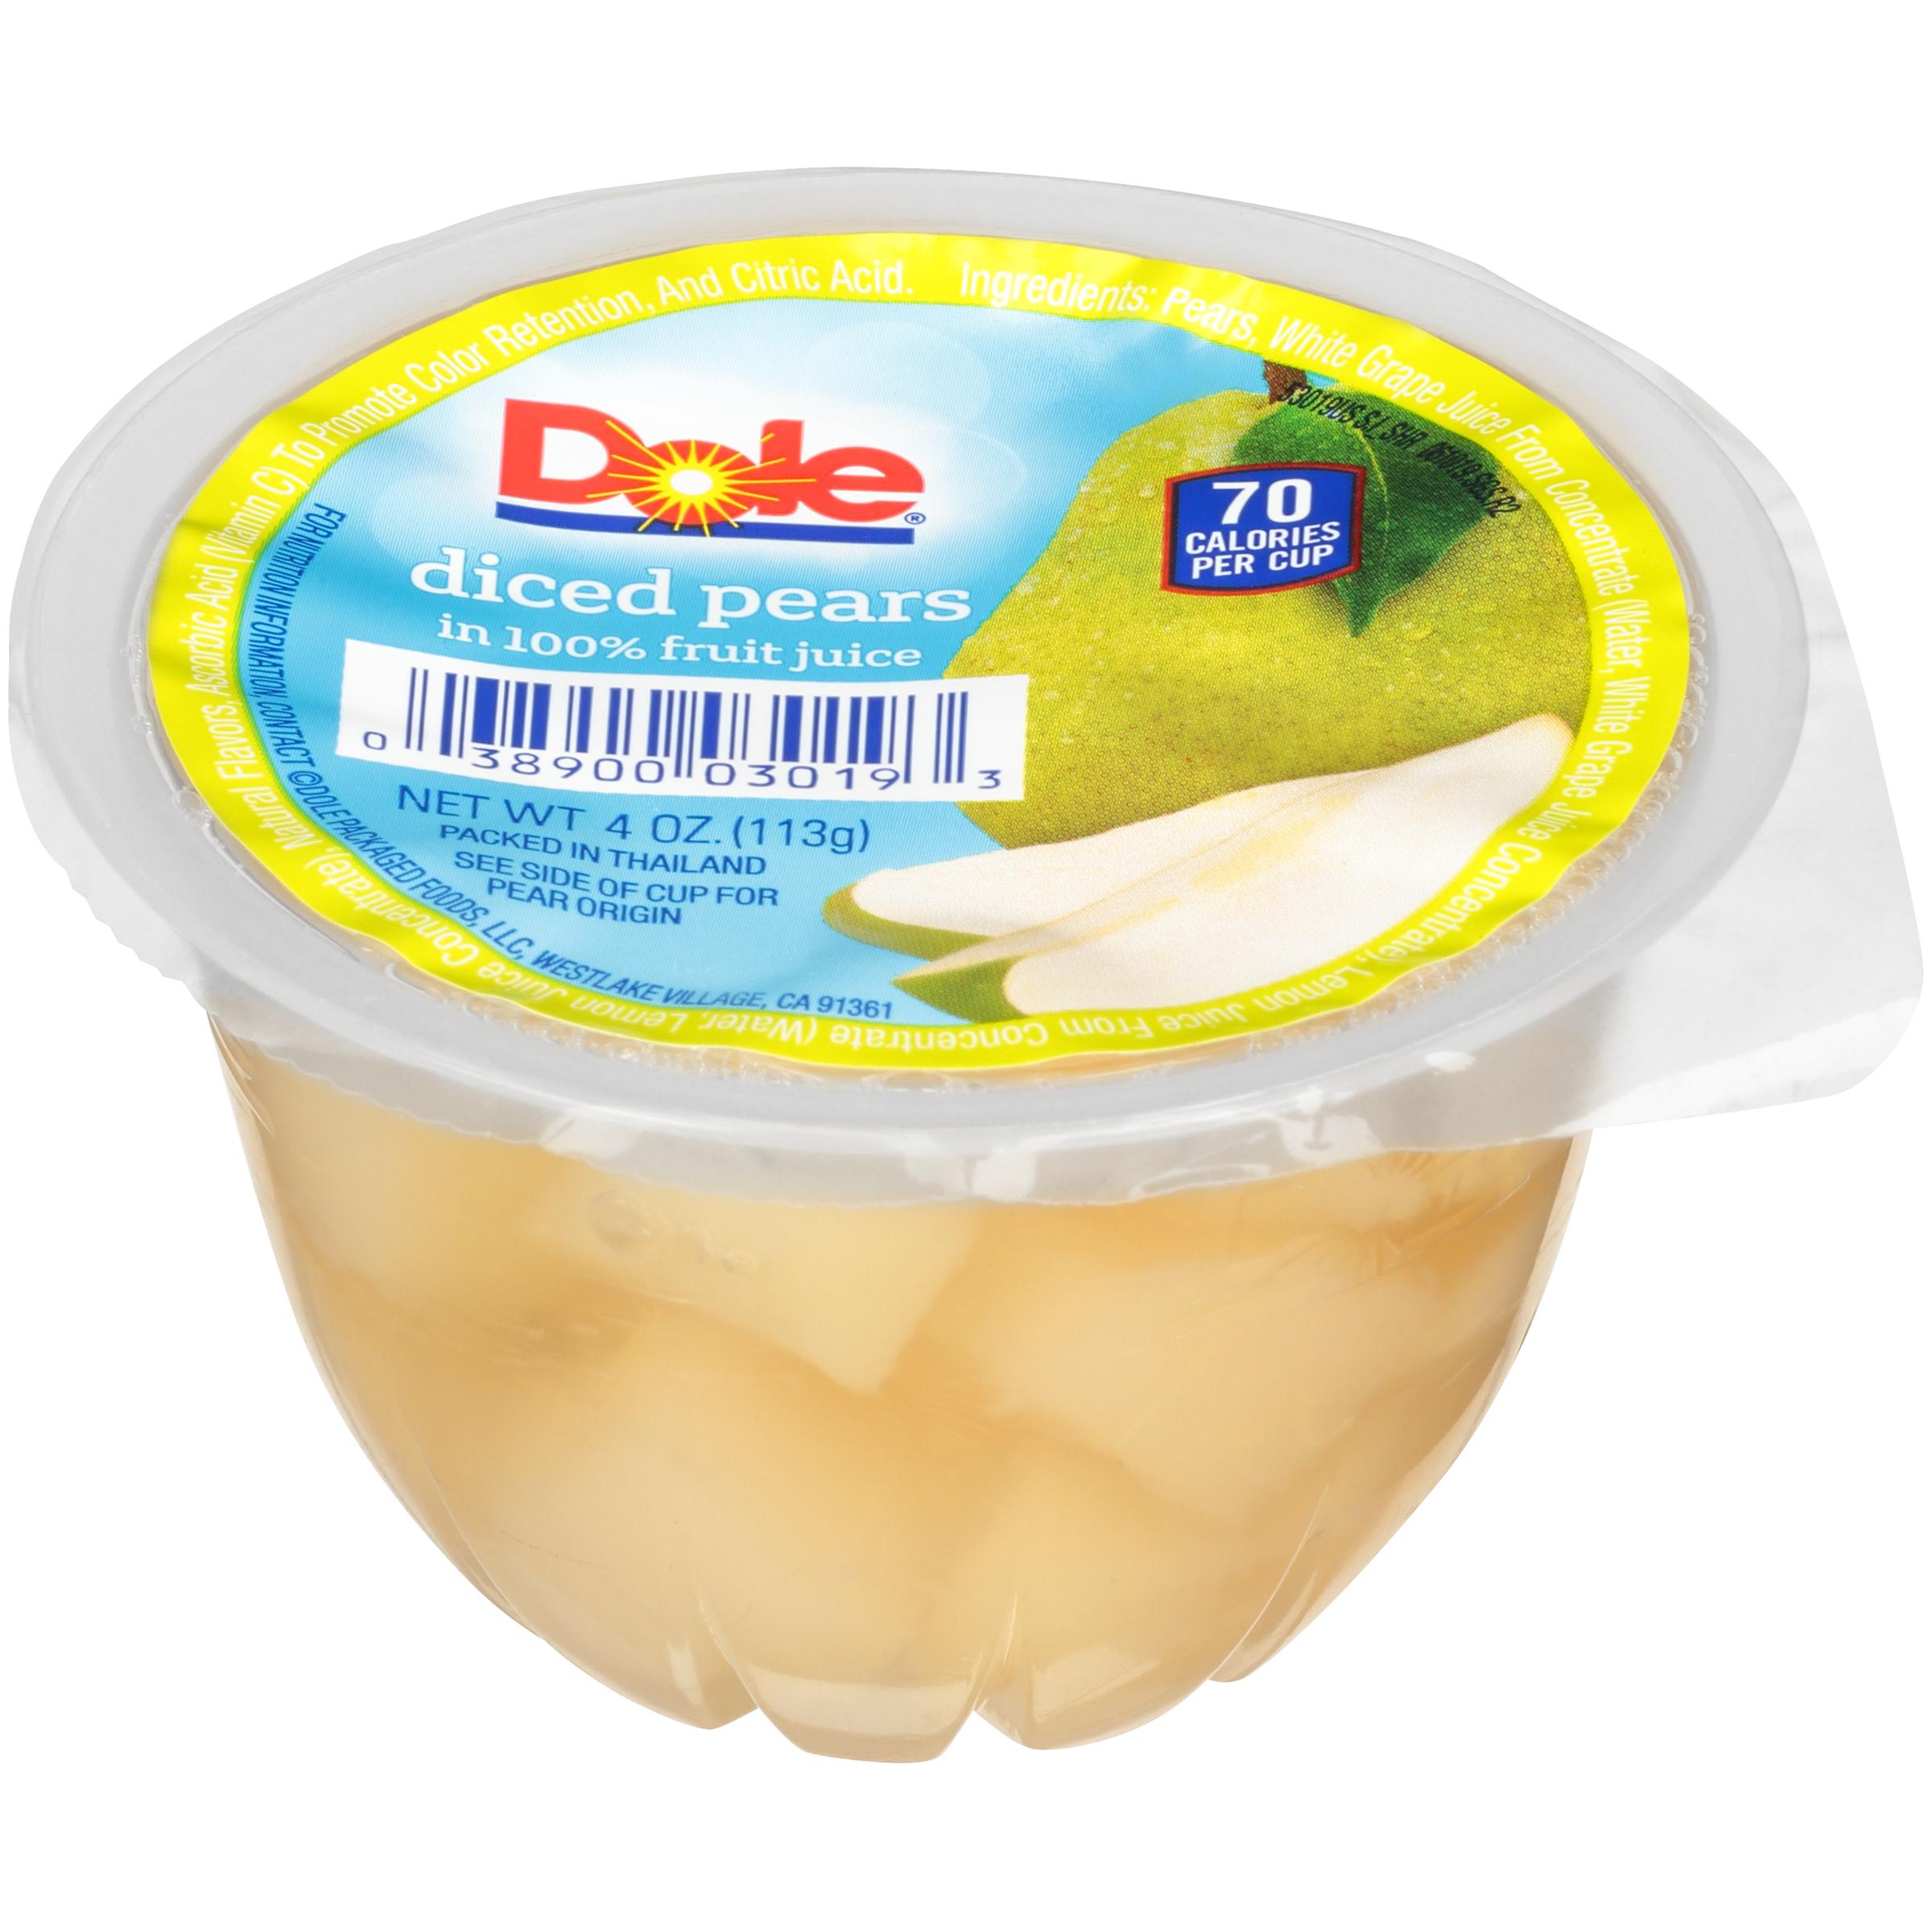 36/4 Diced Pears In Juice